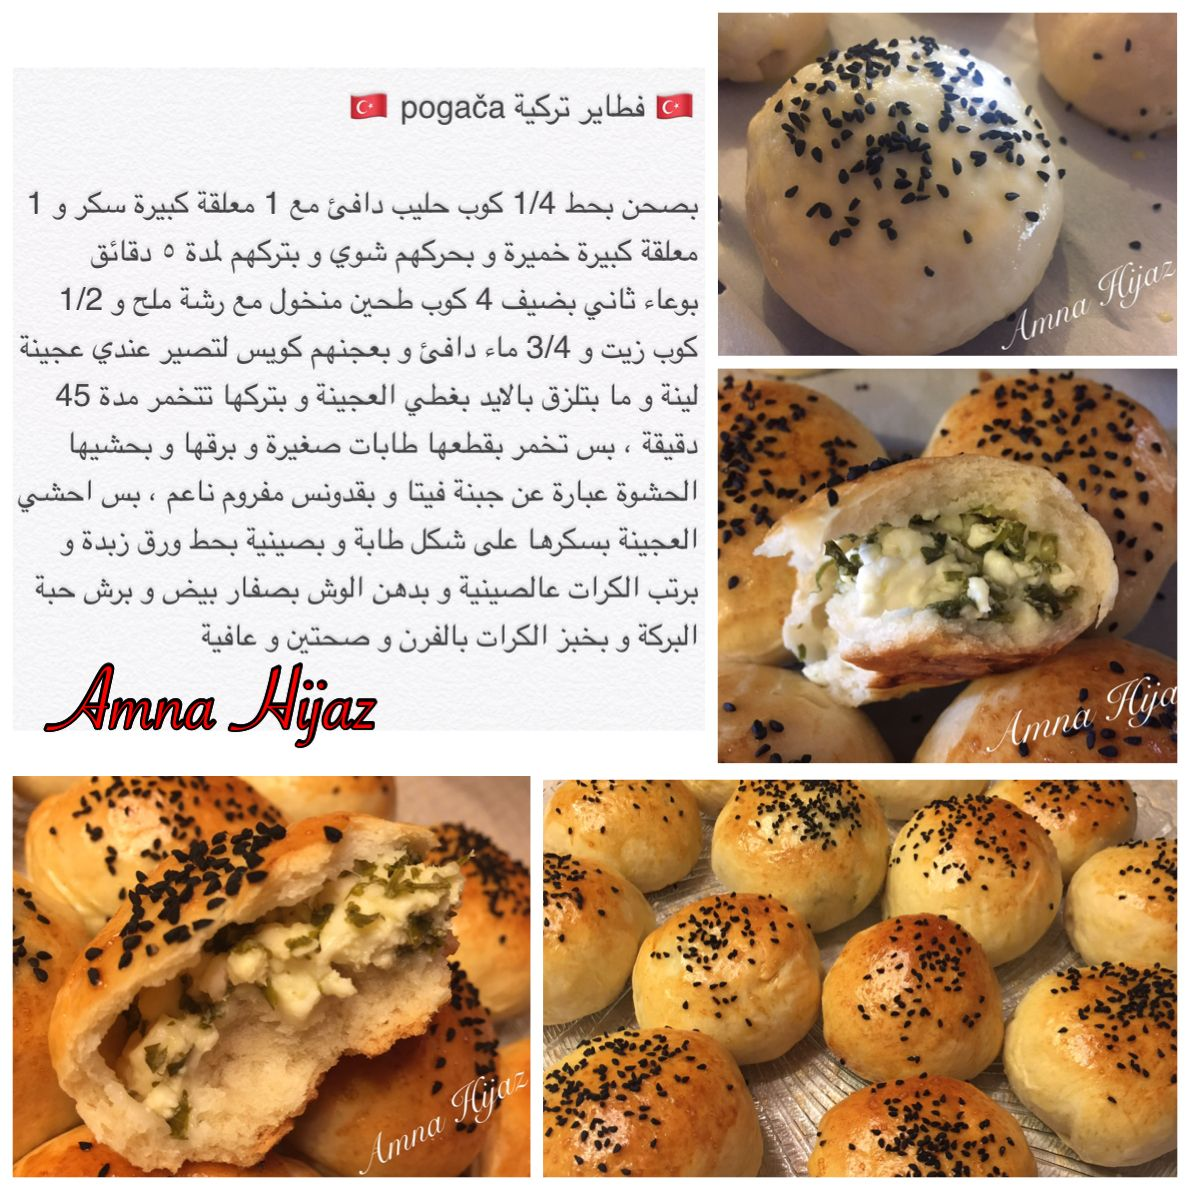 Pogaca فطاير تركية Food And Drink Tasty Dishes Turkish Recipes